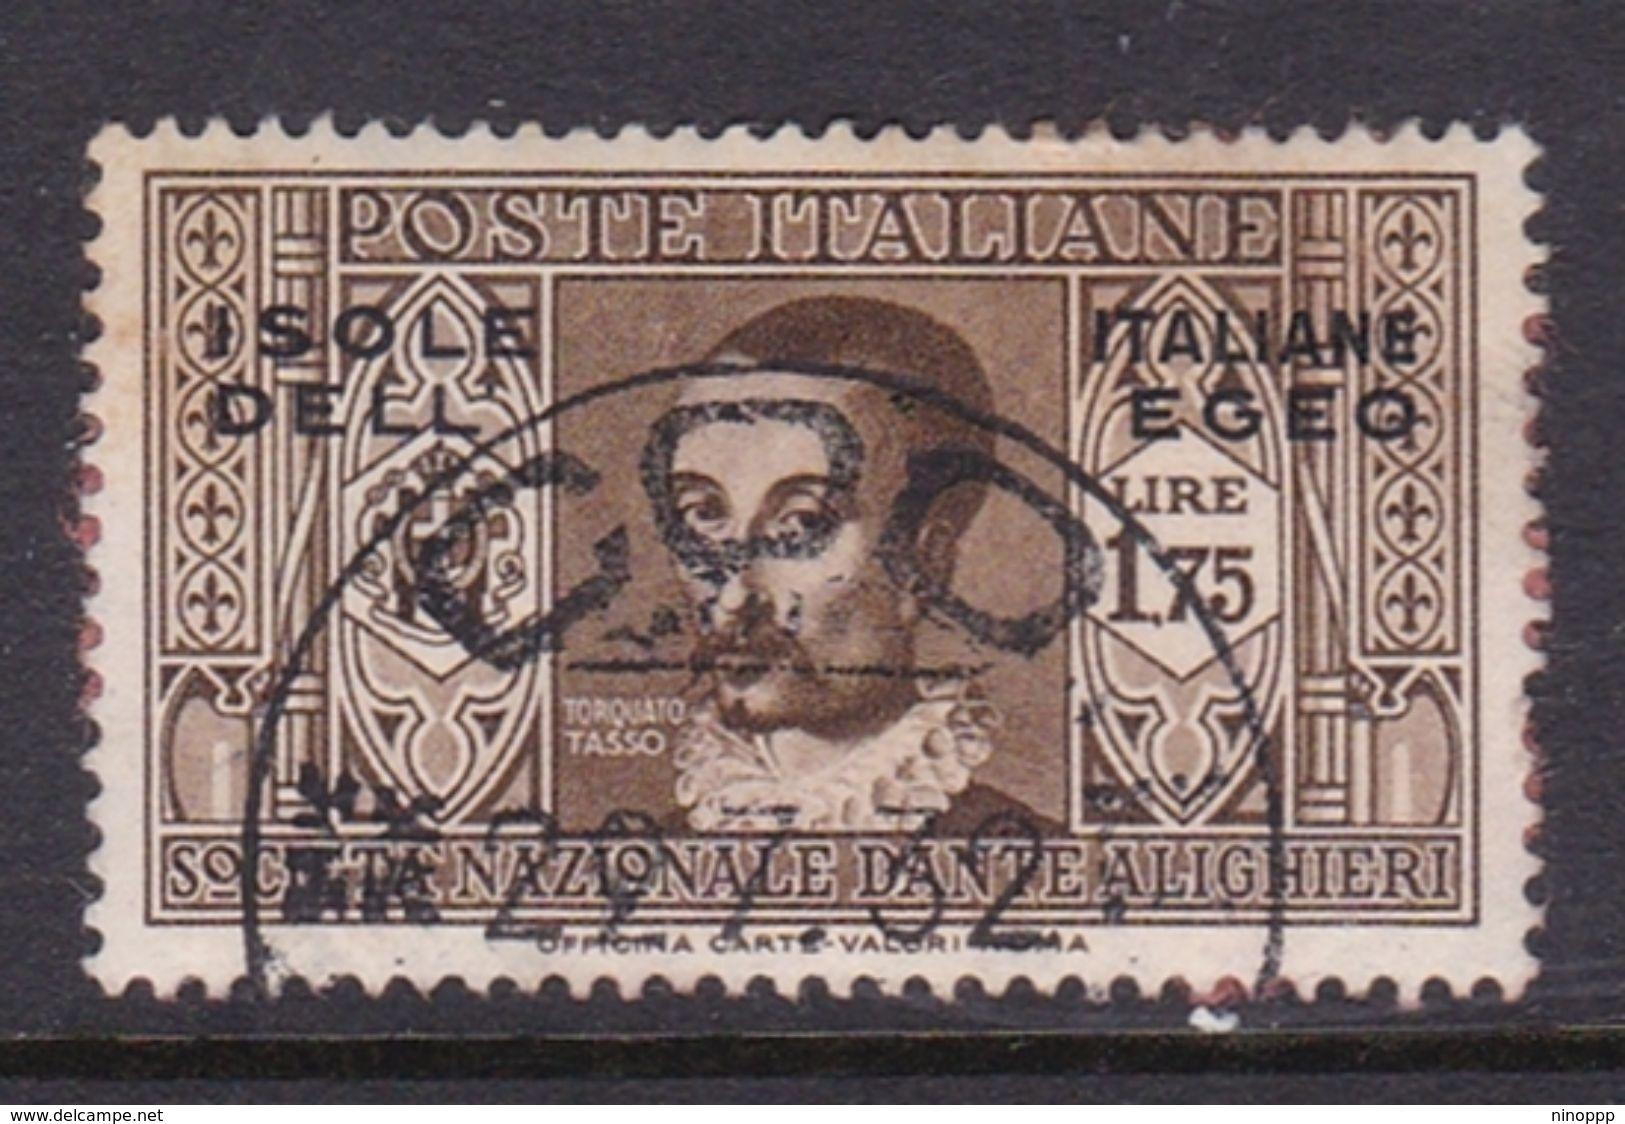 Italy-Colonies And Territories-Aegean General Issue-Rodi S52 1932 Dante Alighieri Lire 1,75 Brown Used - Italy